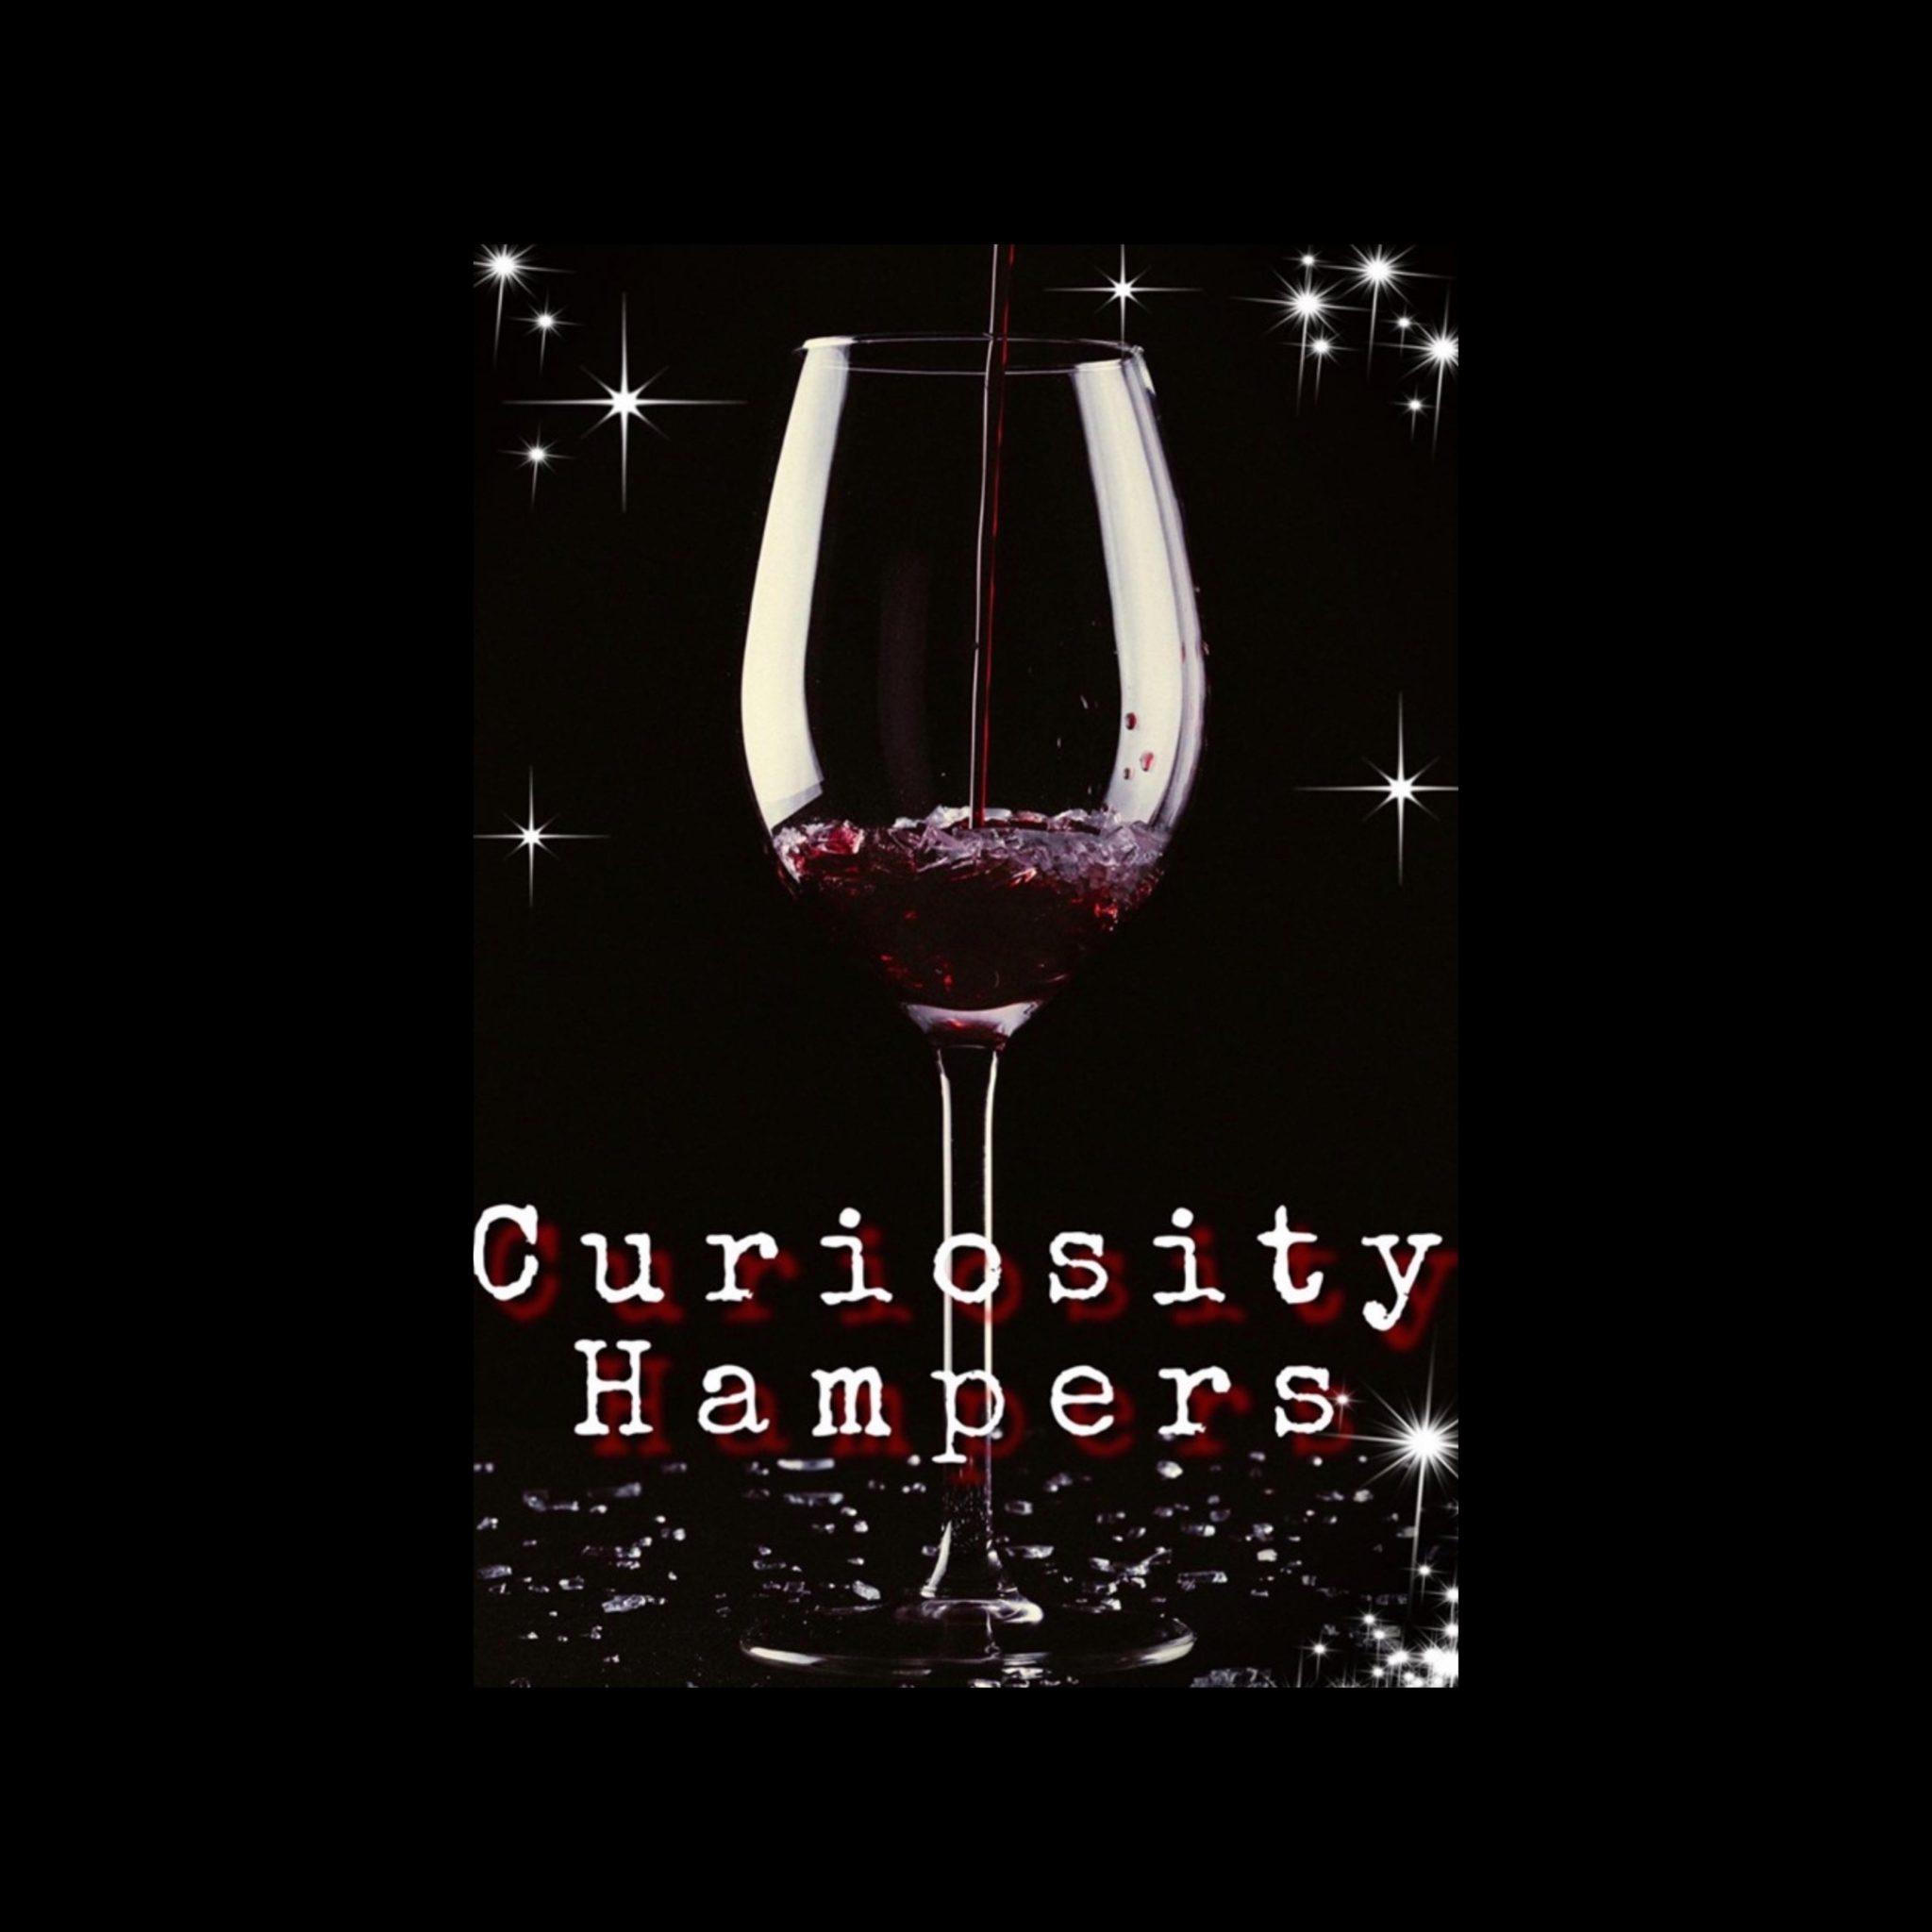 Curiosity Hampers create your hamper